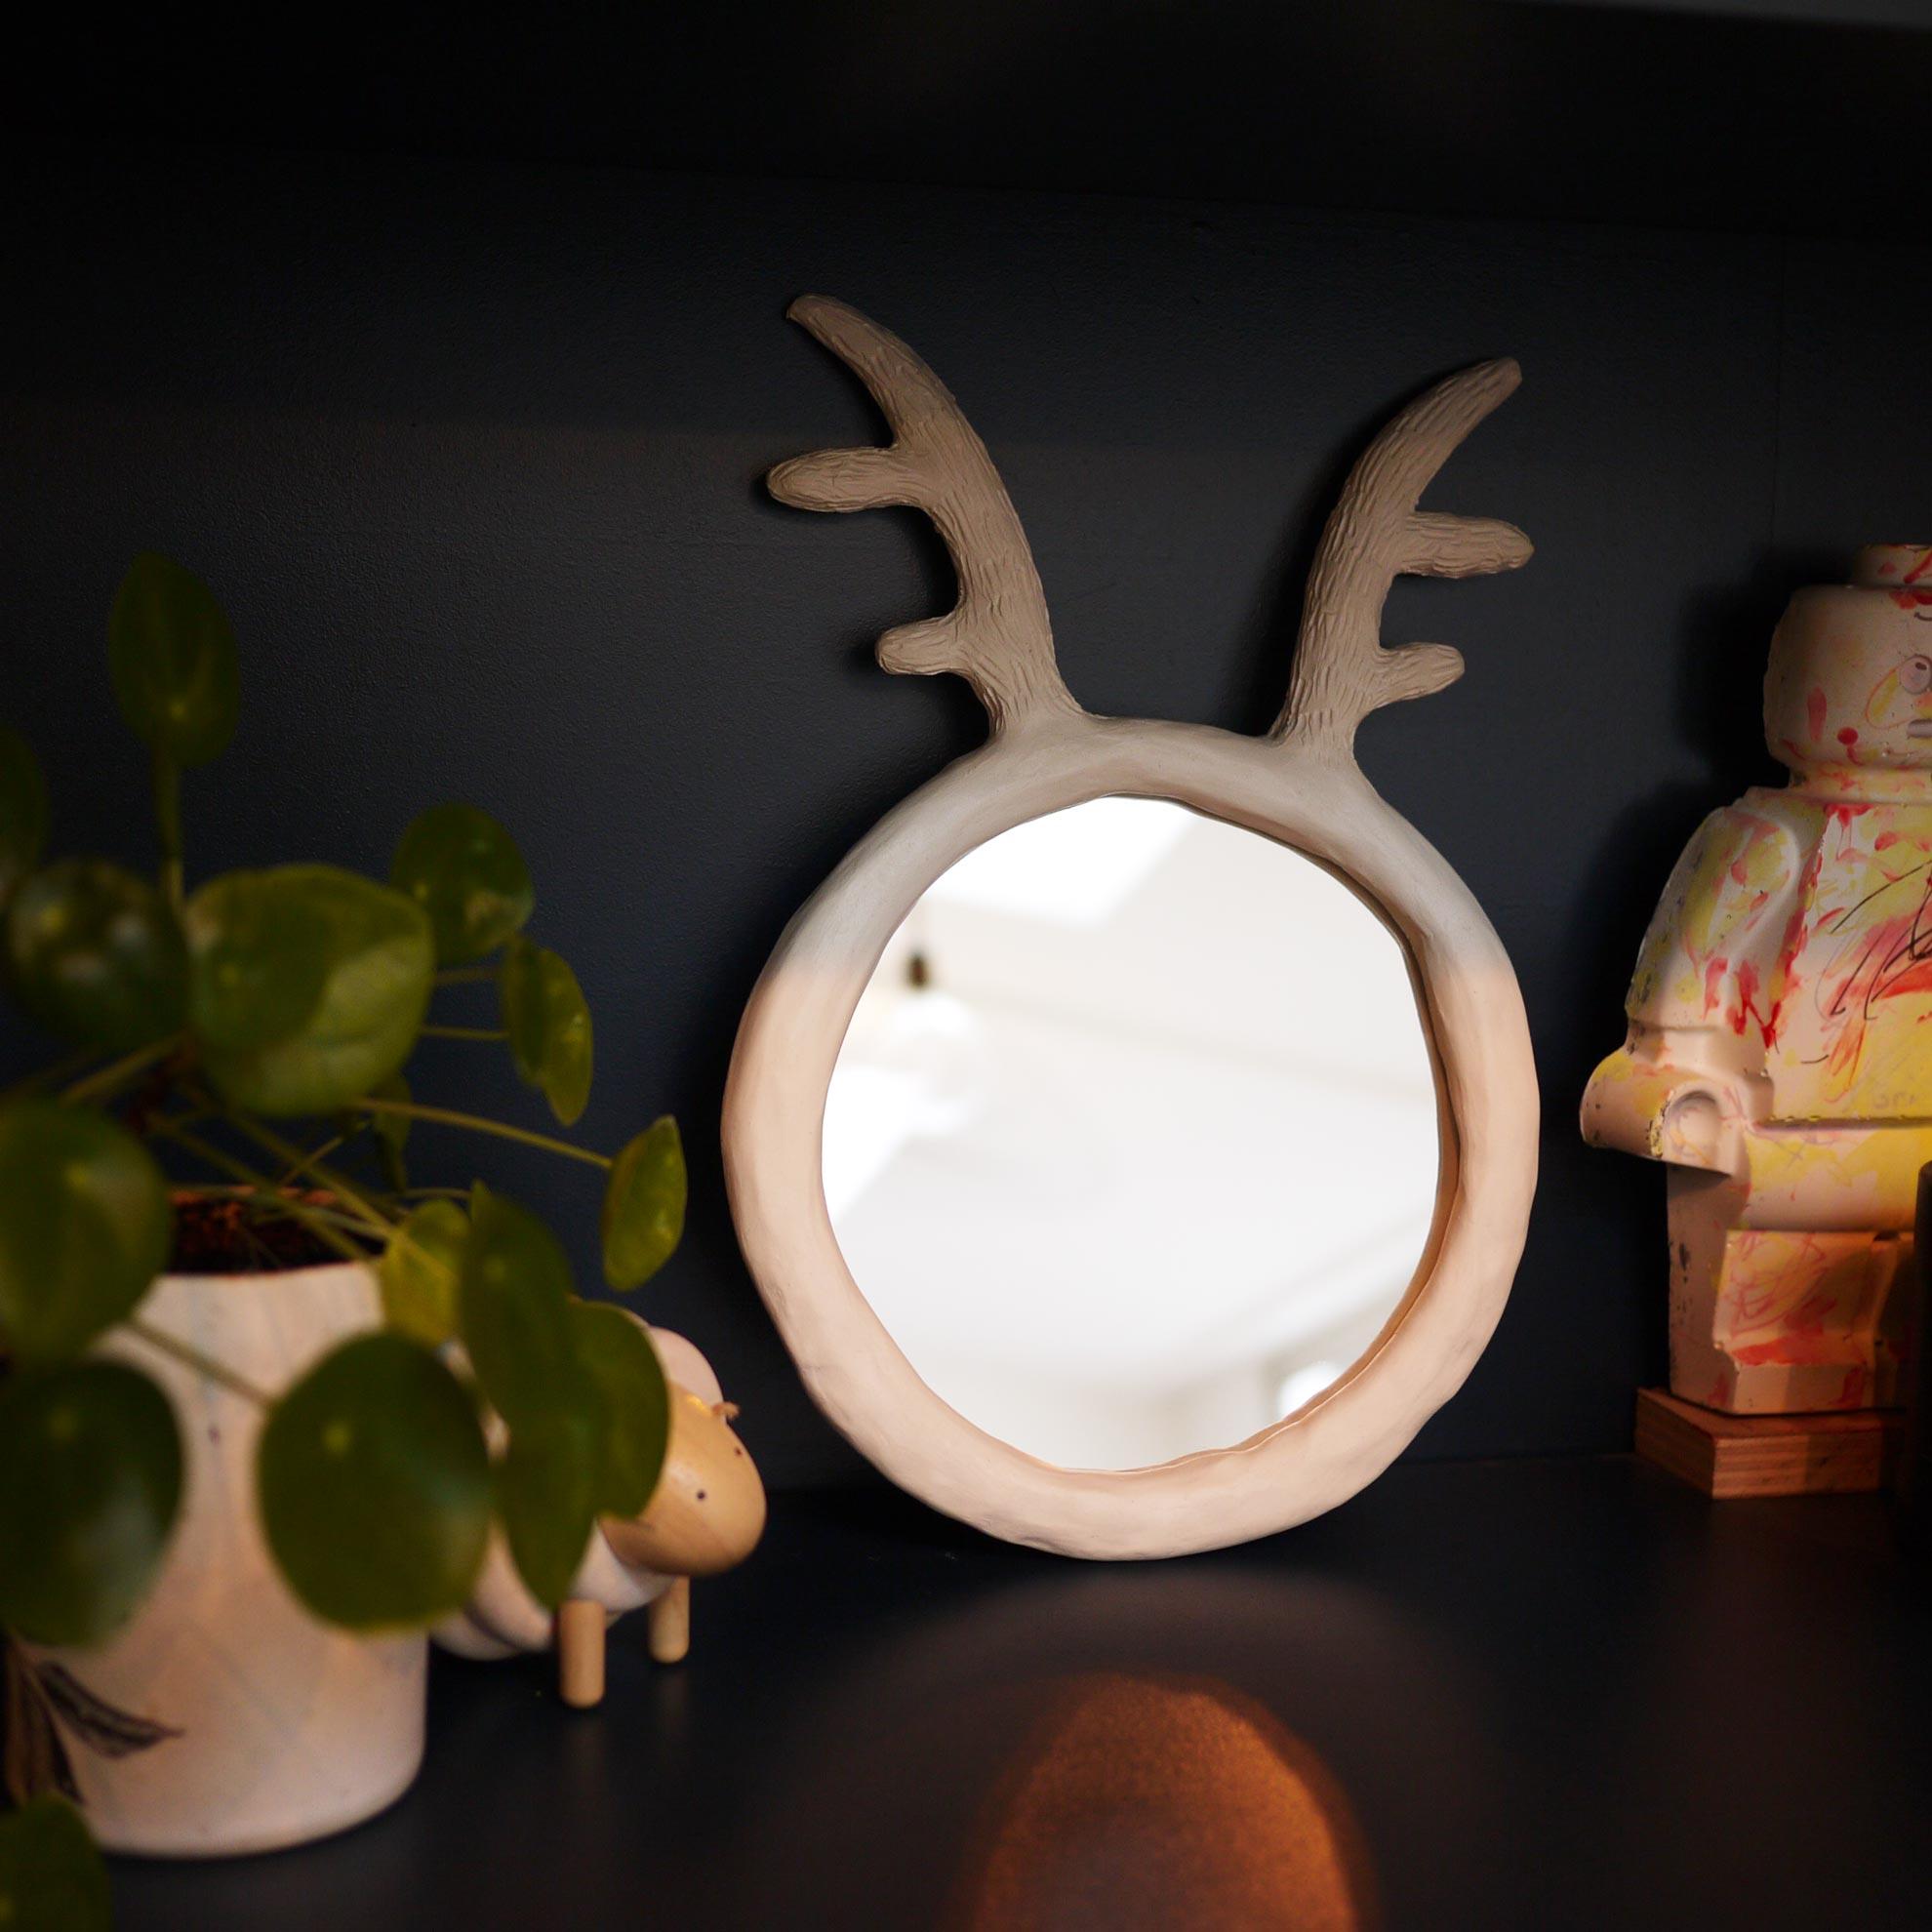 miroir renne artisanal